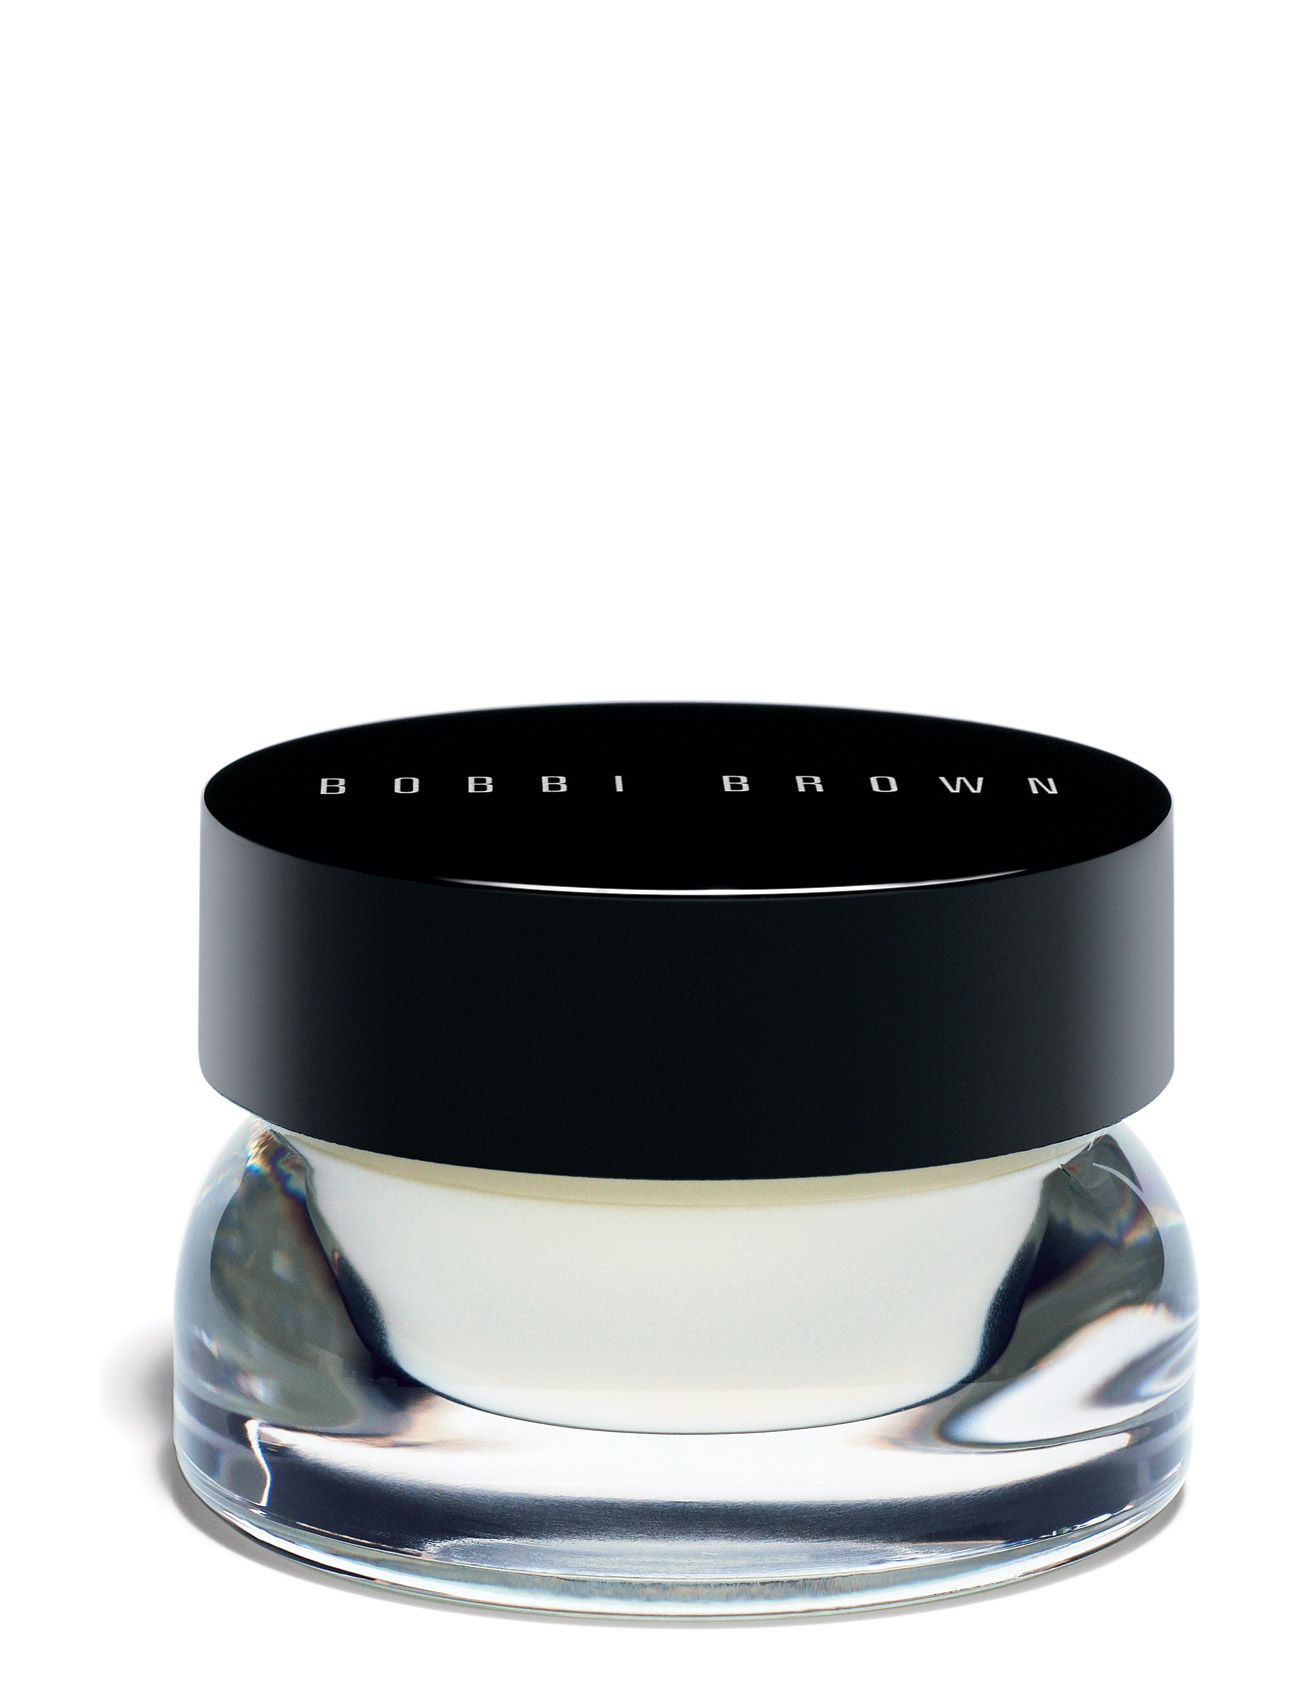 Extra, eye repair cream fra bobbi brown på boozt.com dk